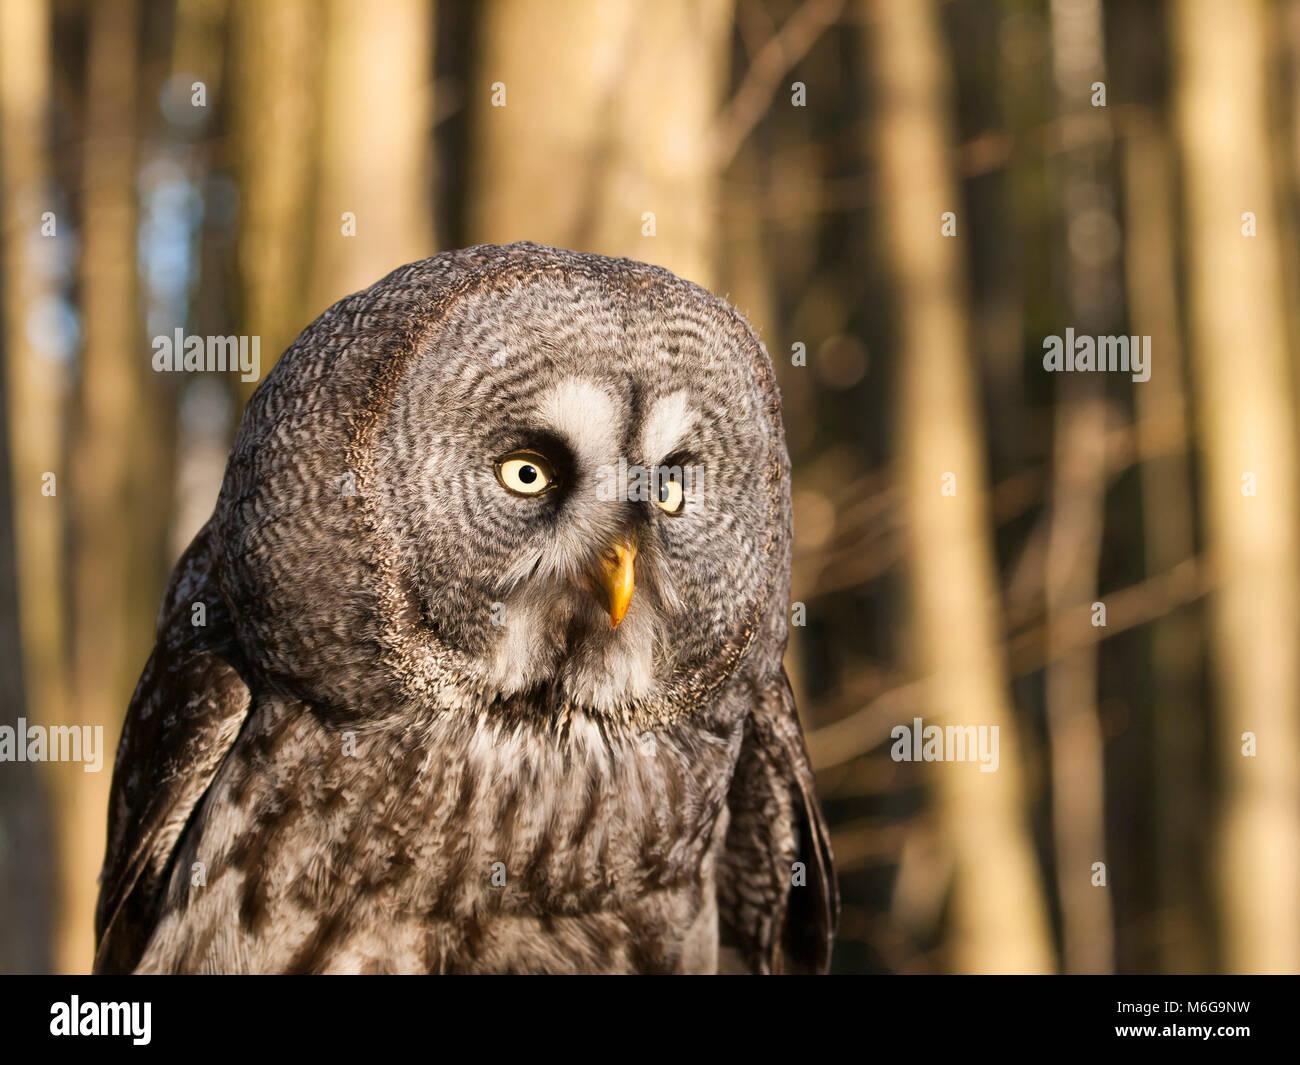 Portrait of one of largest owl - Great grey owl - Strix nebulosa - Stock Image